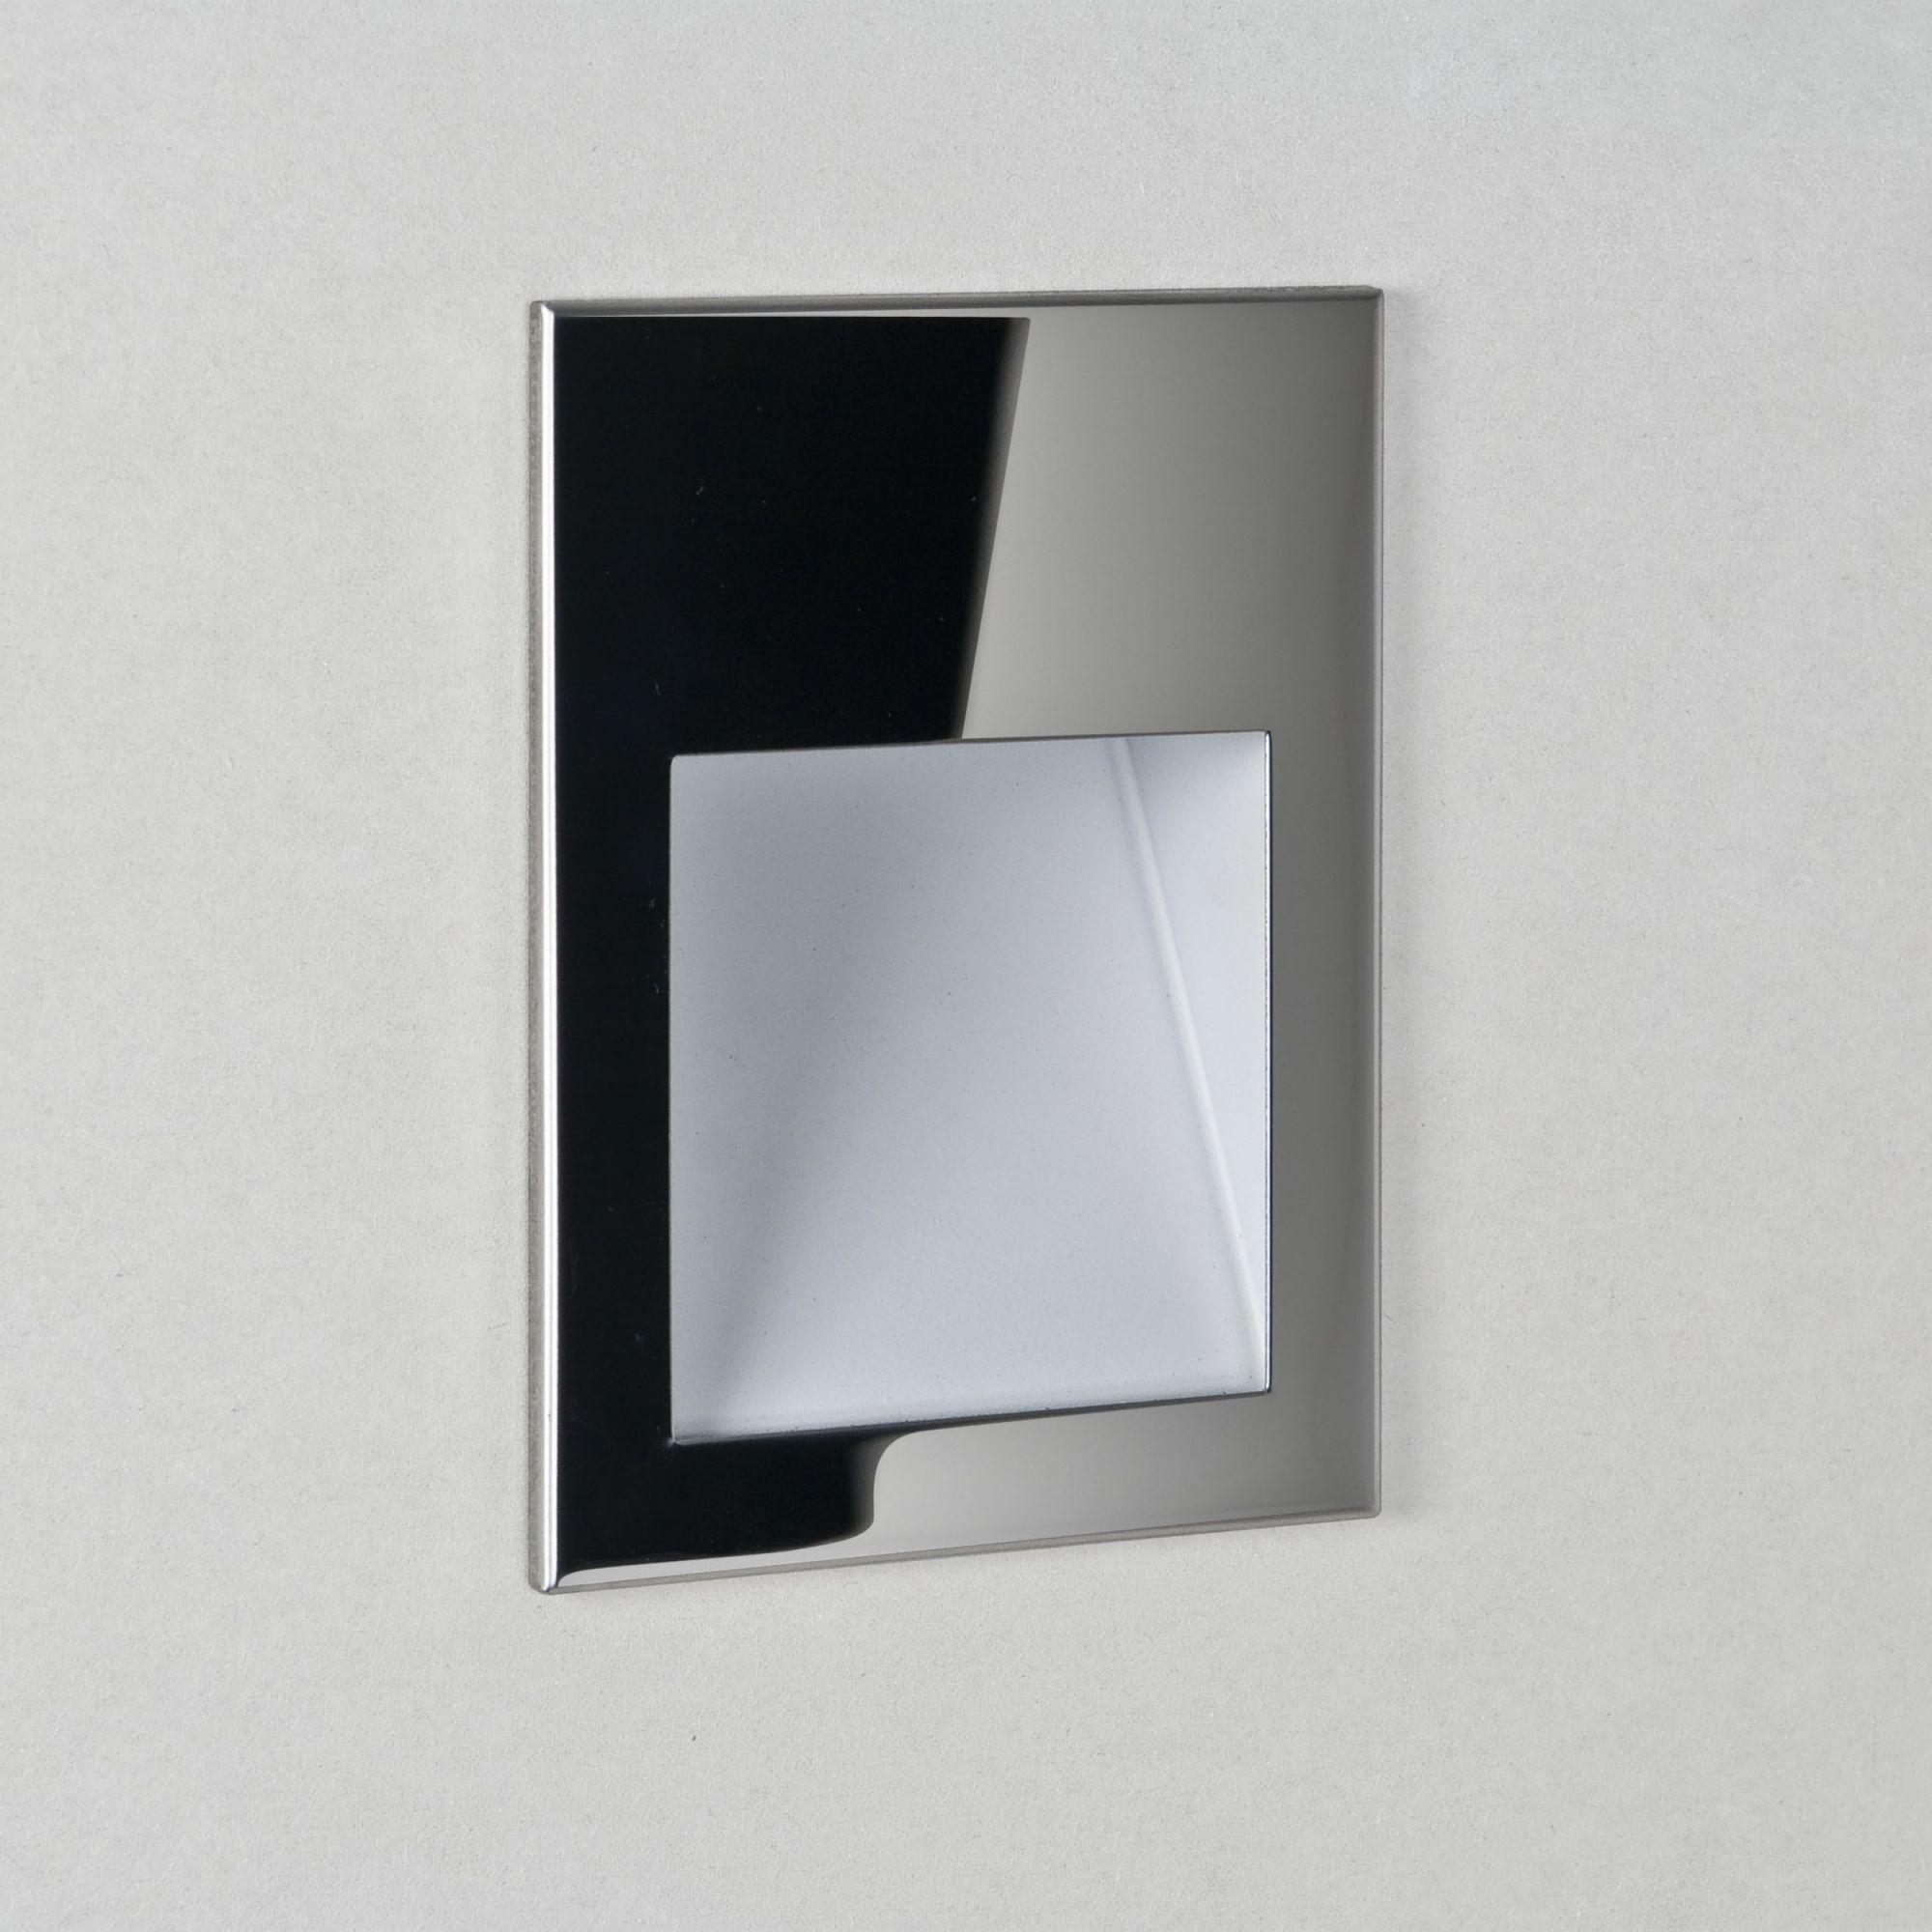 Lampa schodowa Borgo 90 LED 7531 Astro Lighting